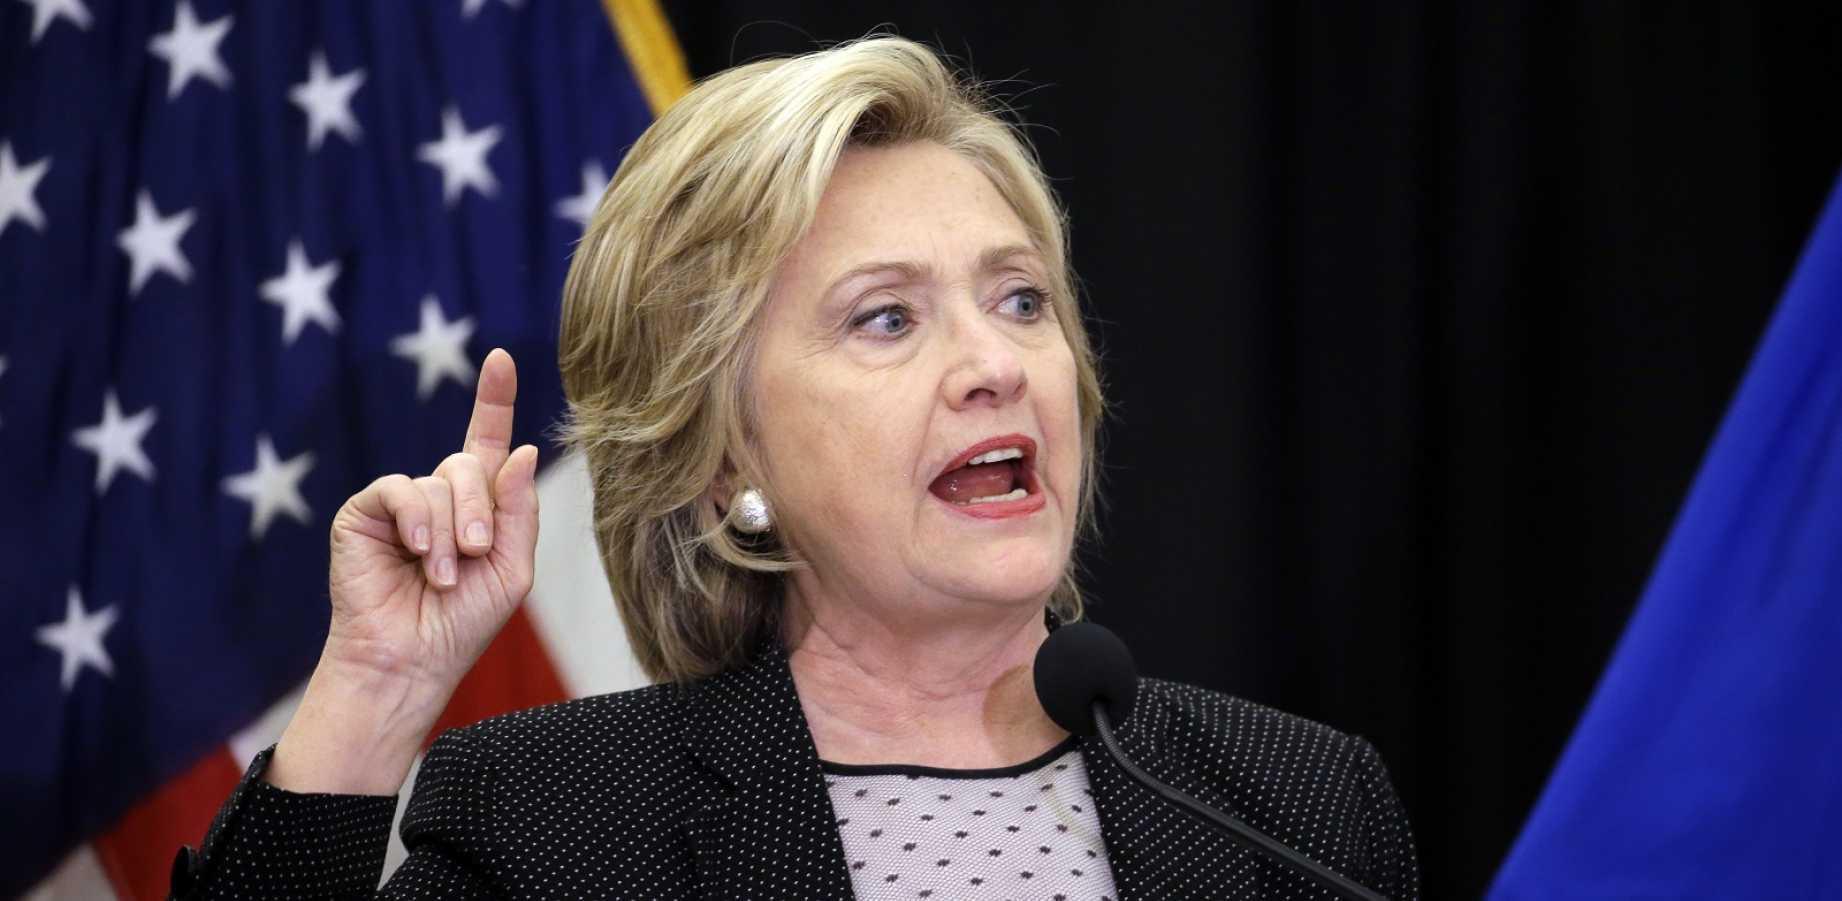 Clinton's Unnecessary Wars